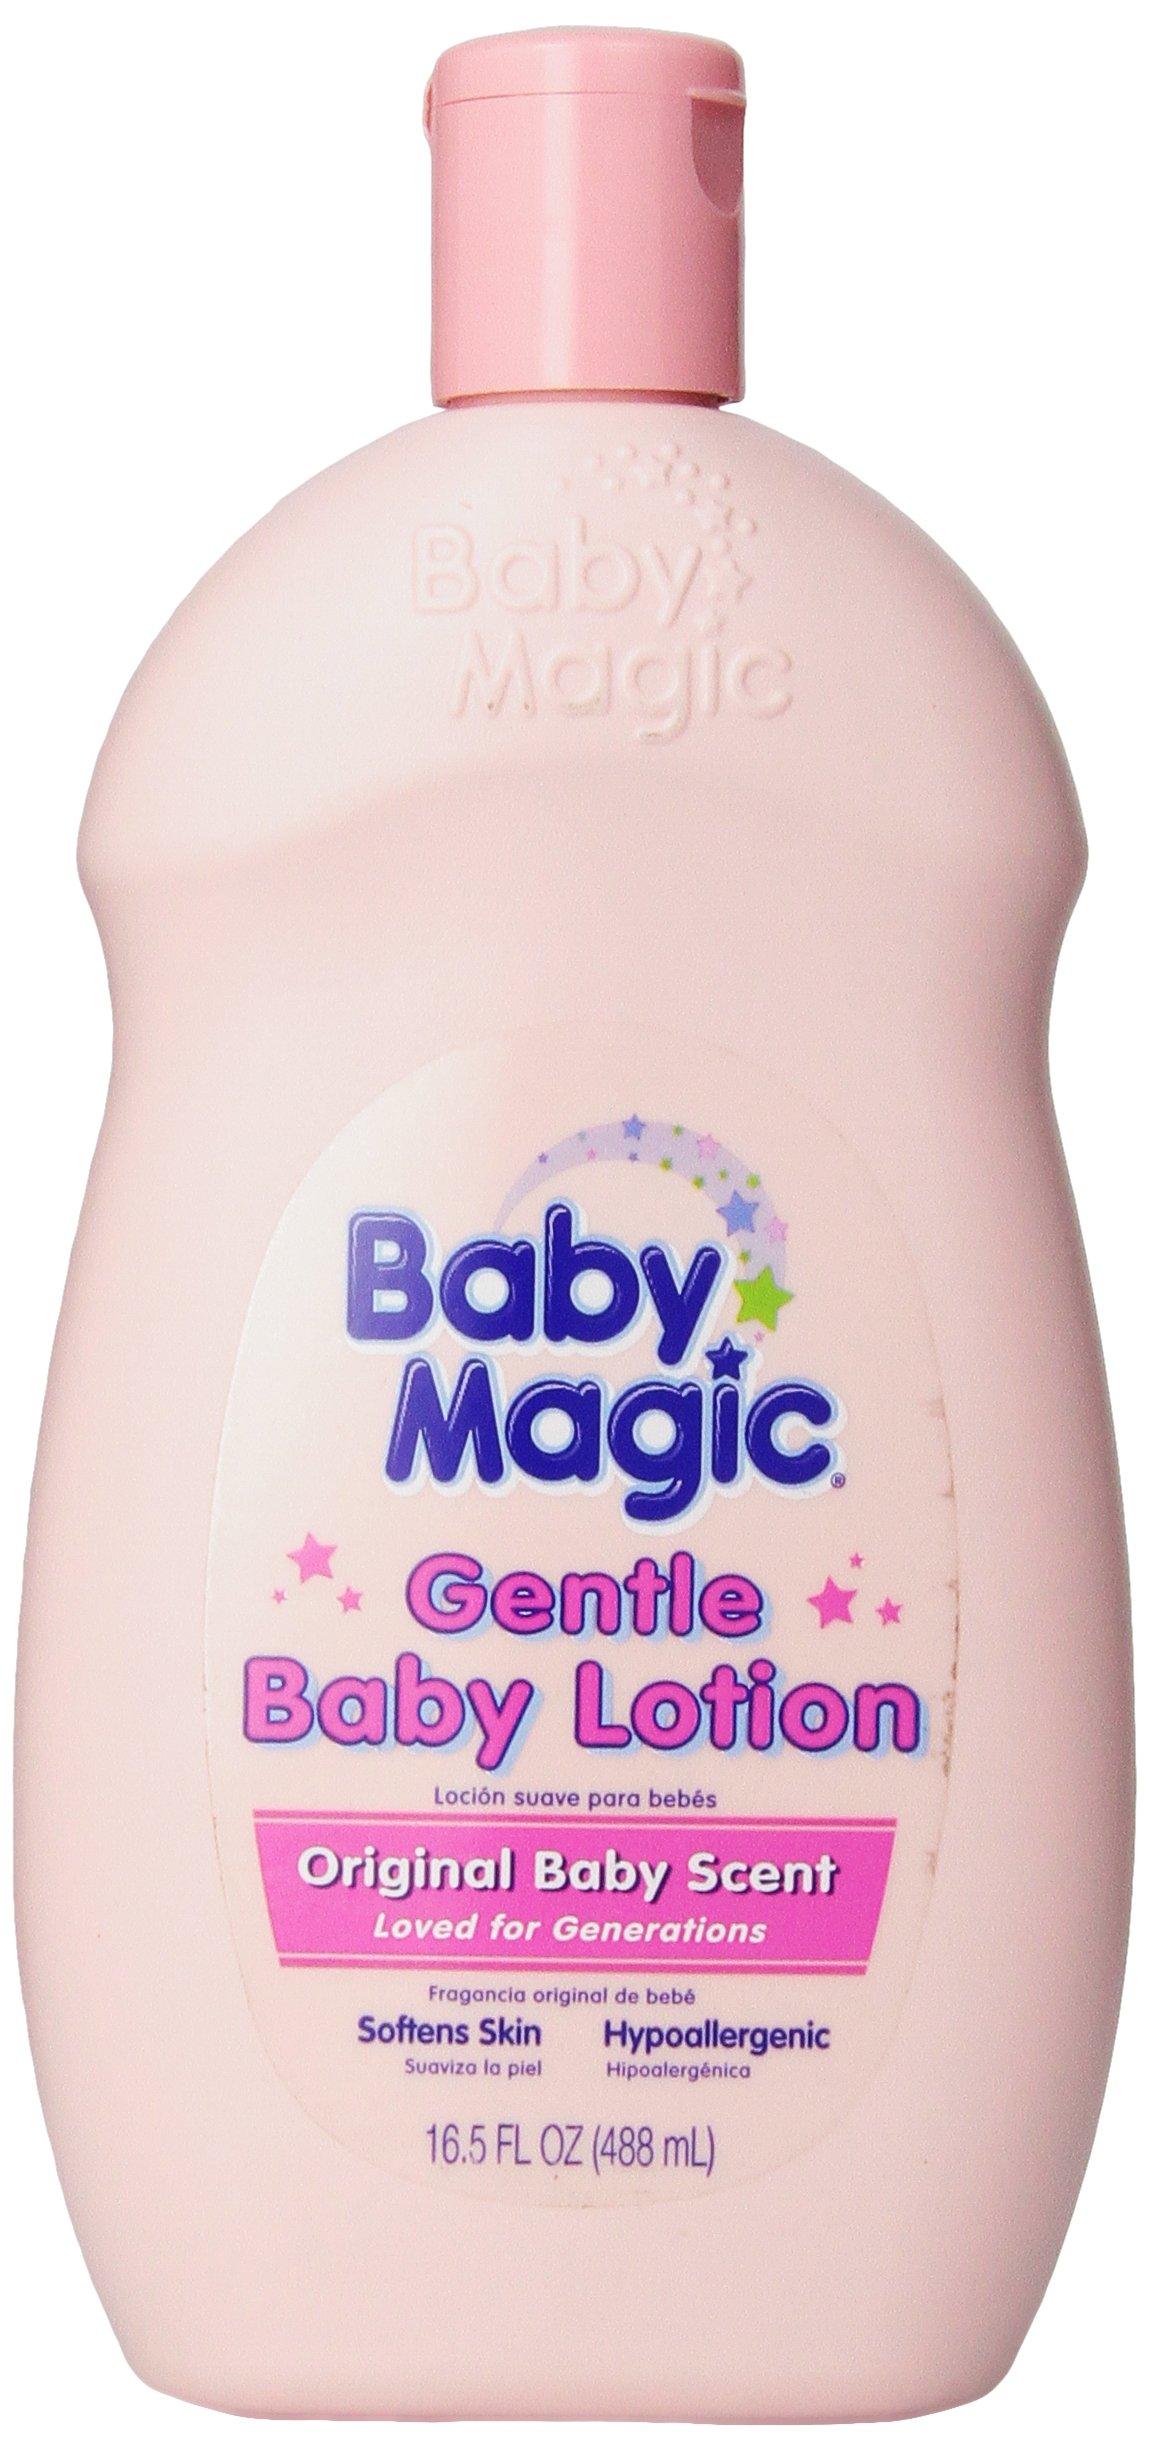 Baby Magic Gentle Baby Lotion Original Baby Scent 16.5 oz.